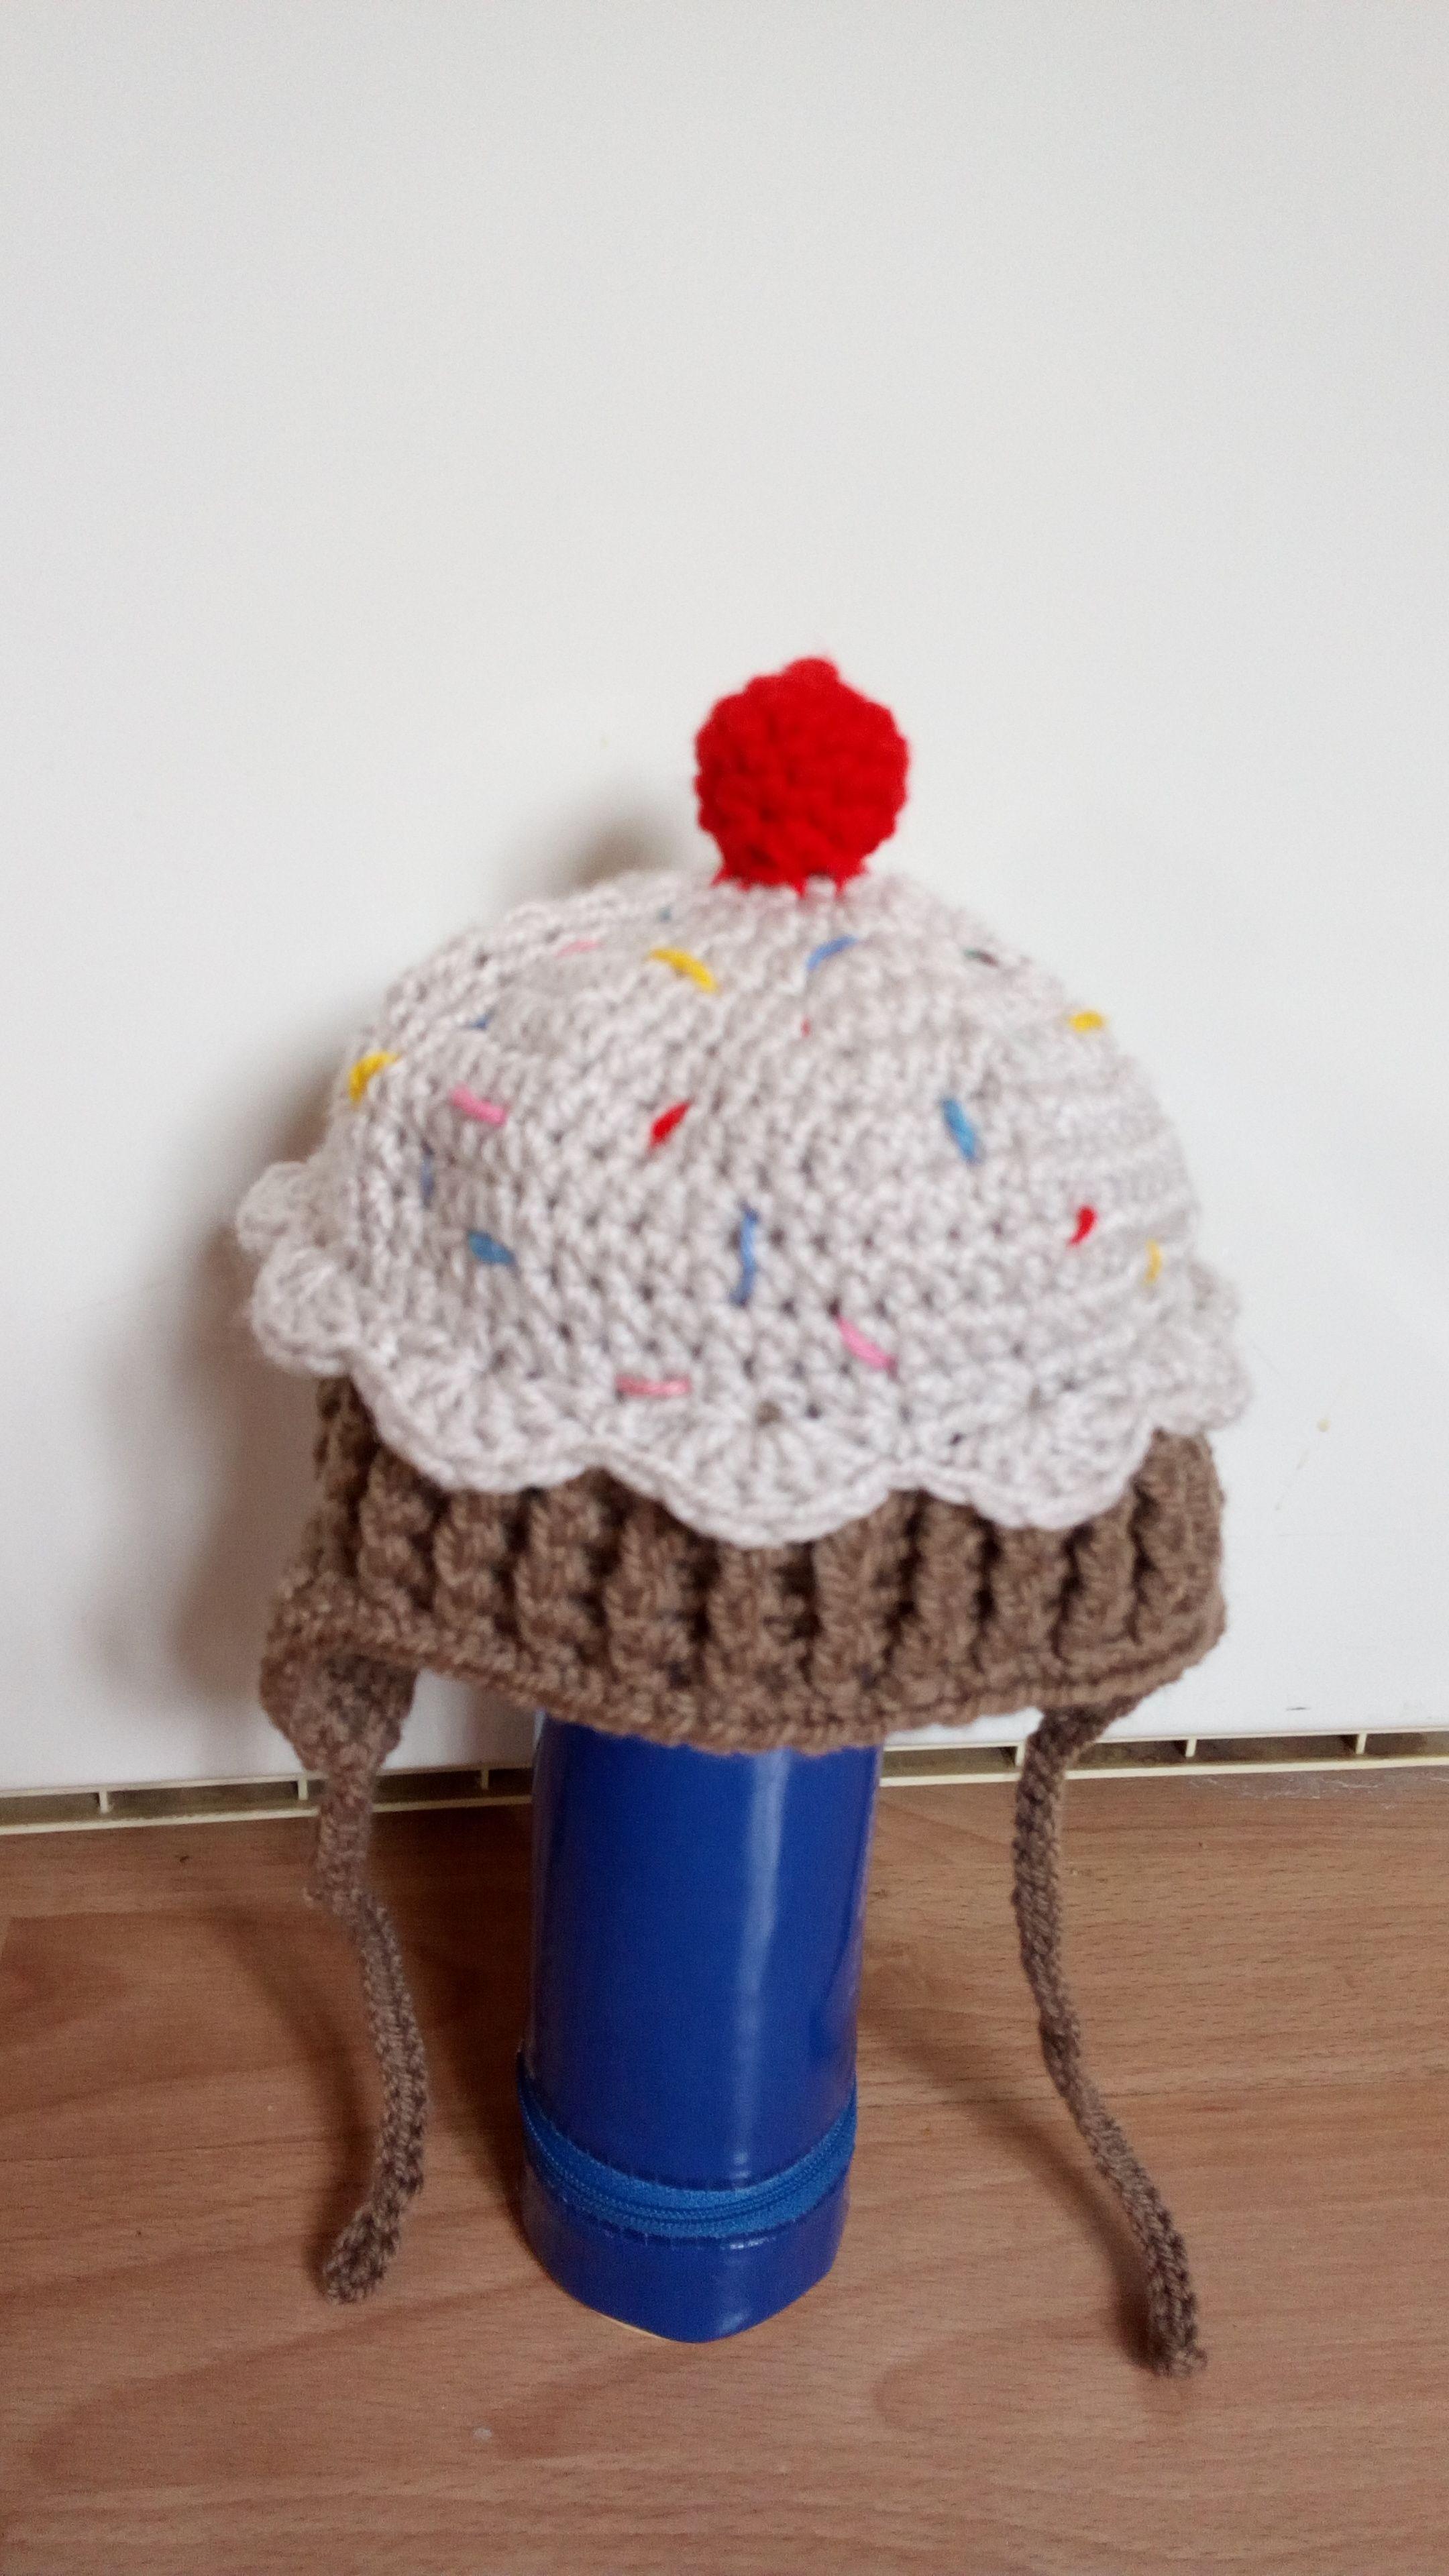 cupcake hat   Cupcake hats, Crochet hats, Hats